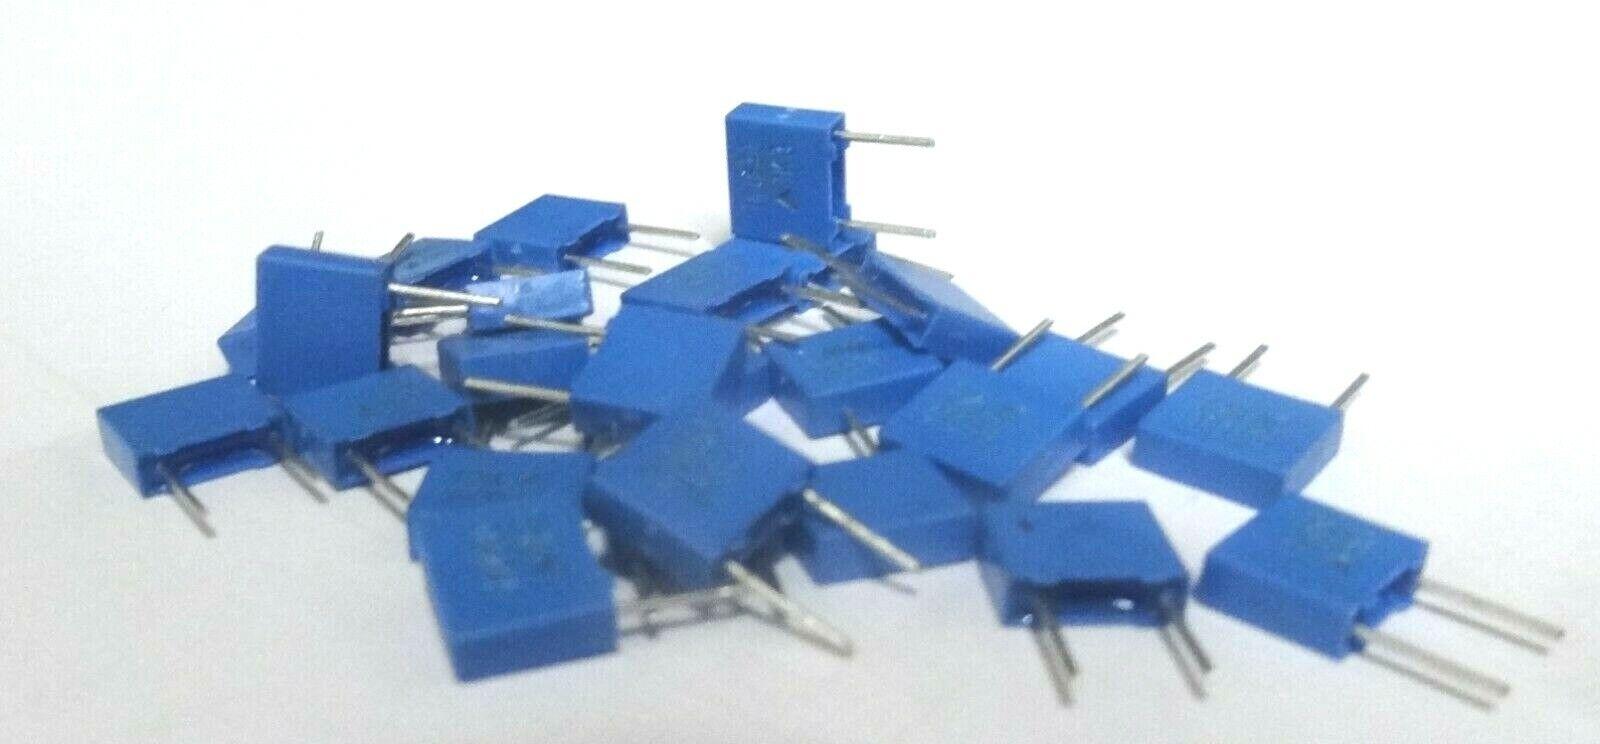 25x 1nf 5mm pitch 630v DC miniature polyester capacitor B32529C8102J 1000pf 102